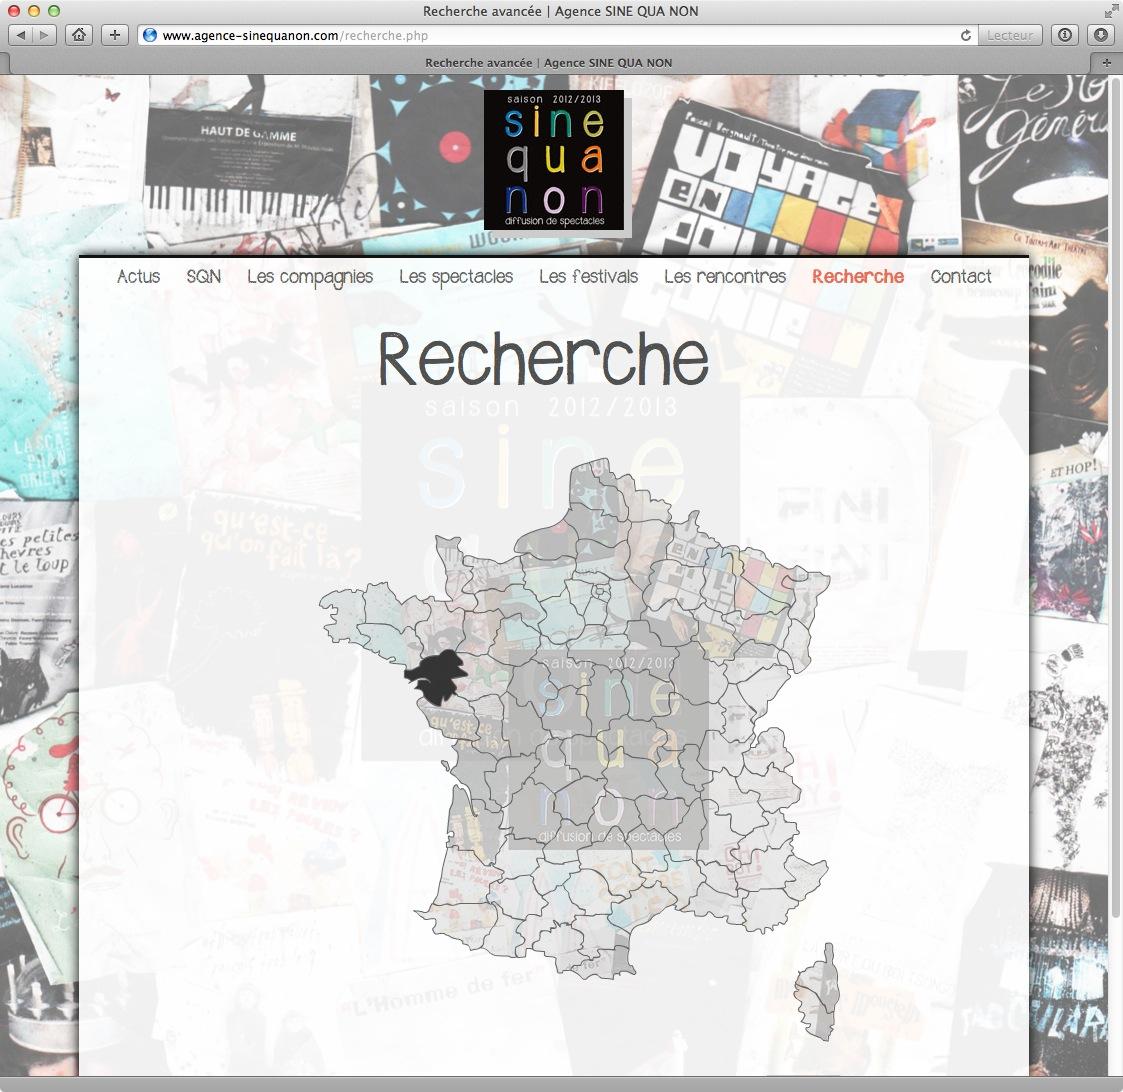 Agence SINE QUA NON - 2012/2013 - bureau2crea